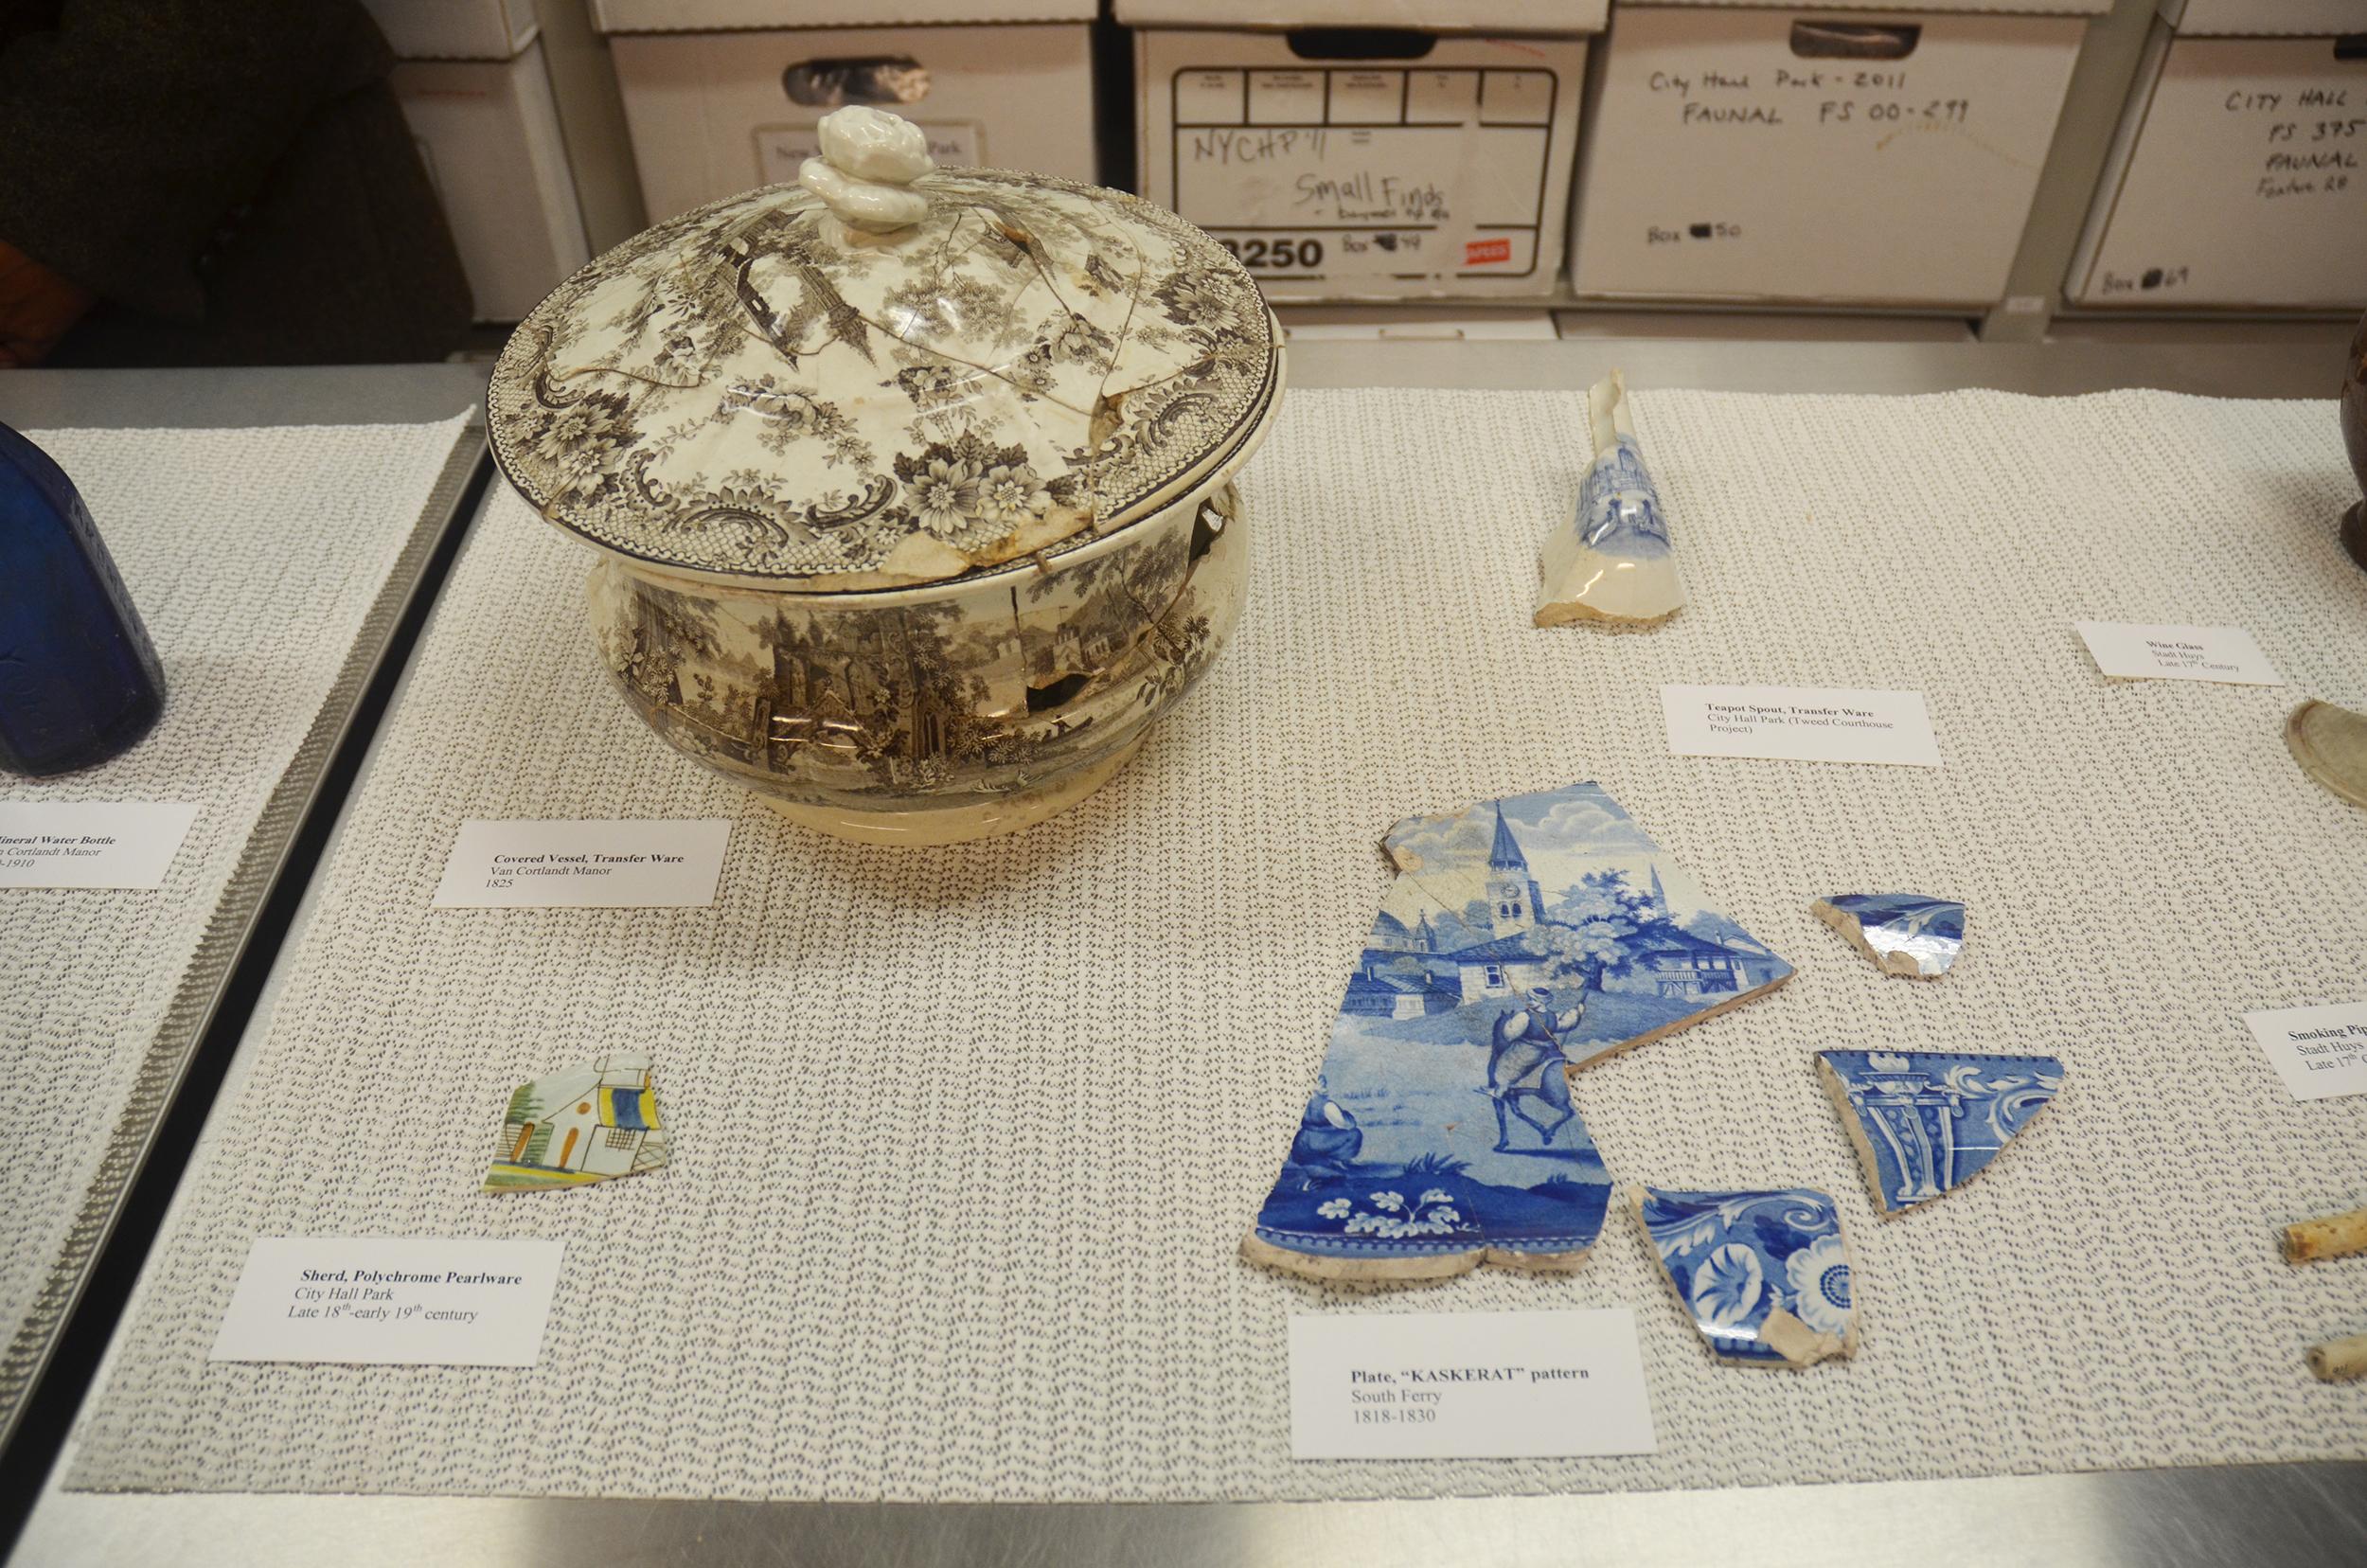 LPCArchaeologicalRepository_EvanBindelglass_20161005_04